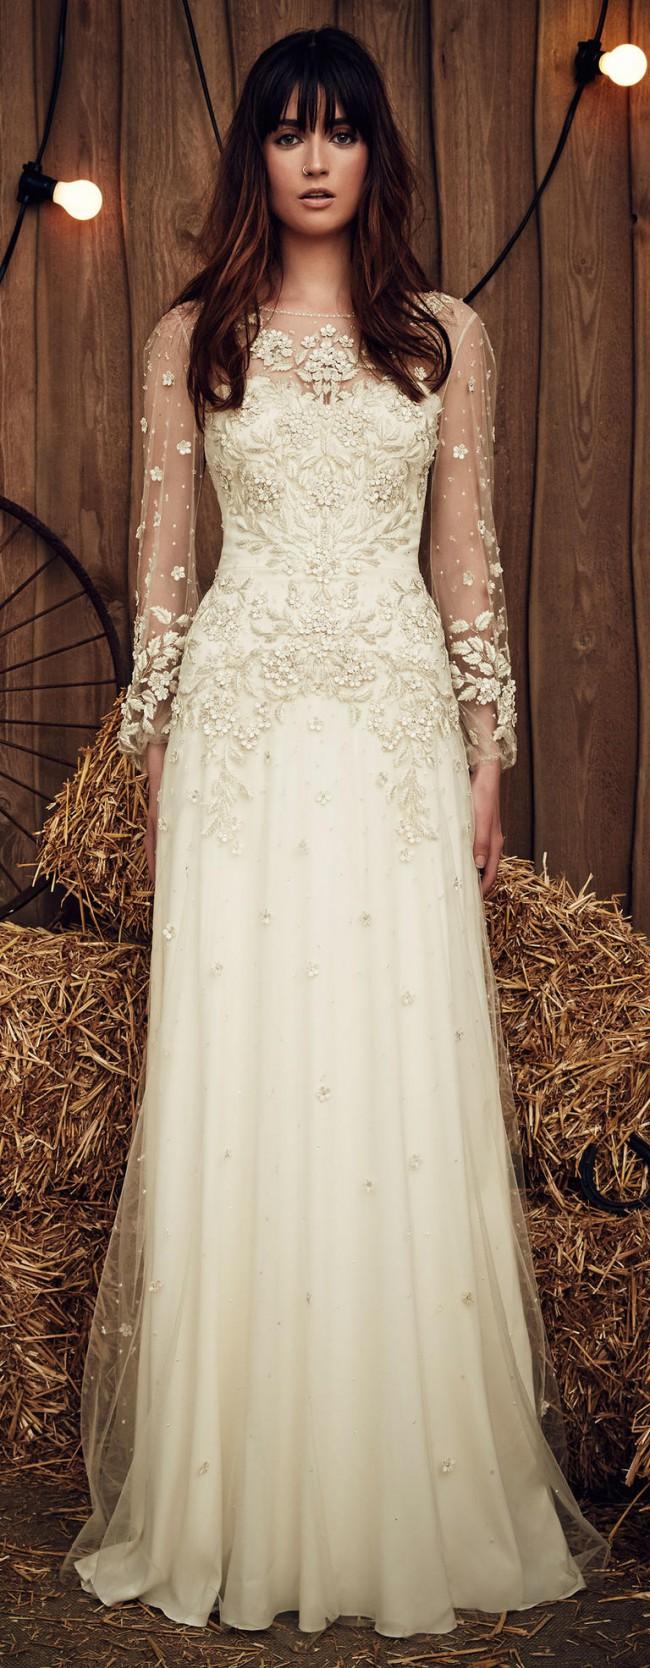 Jenny Packham Apache Second Hand Wedding Dress On Sale 52 Off